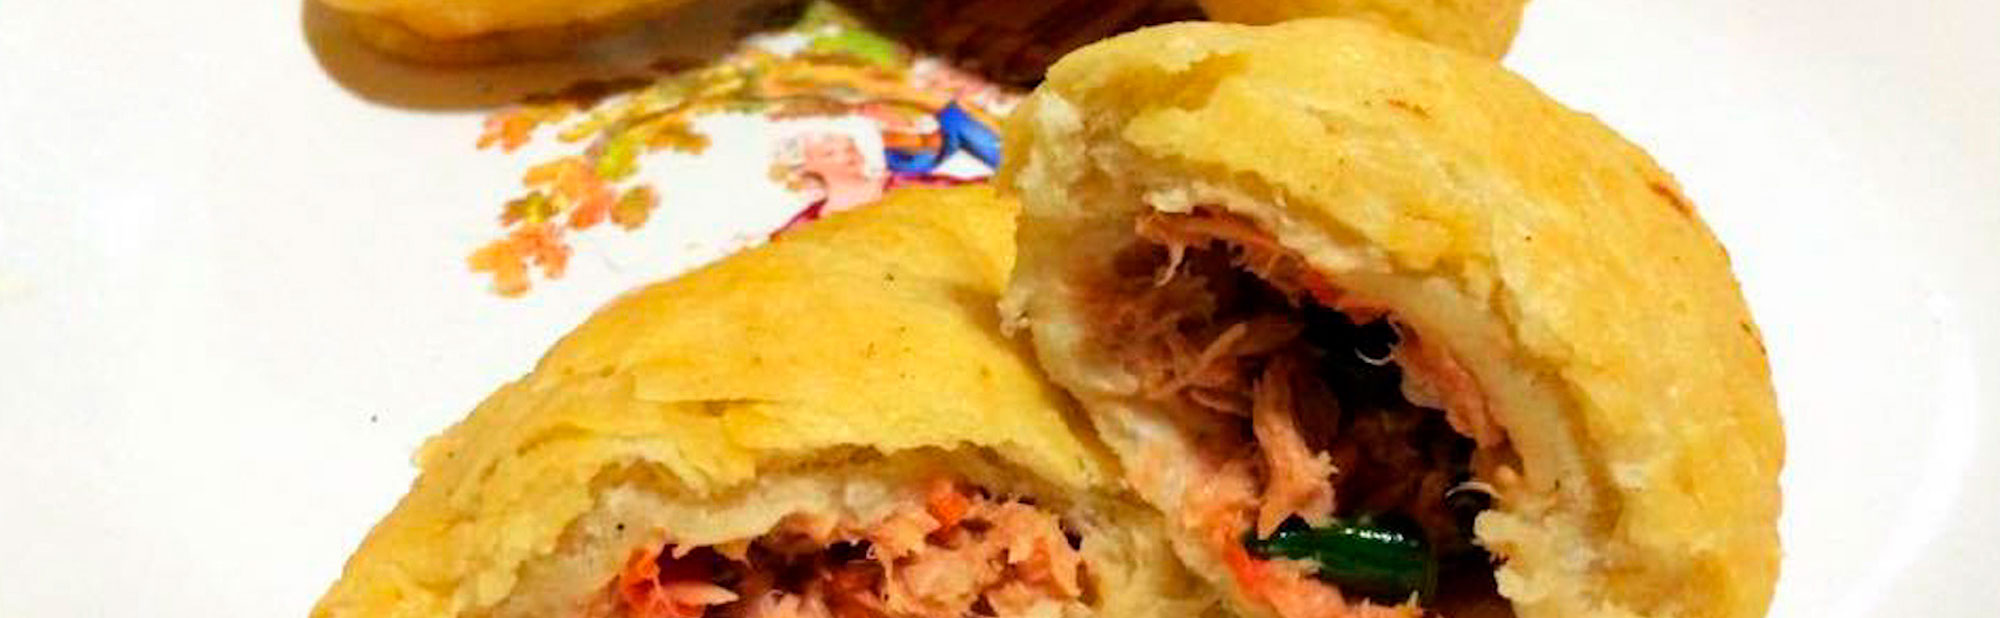 La Antojadera | Empanadas Fritas